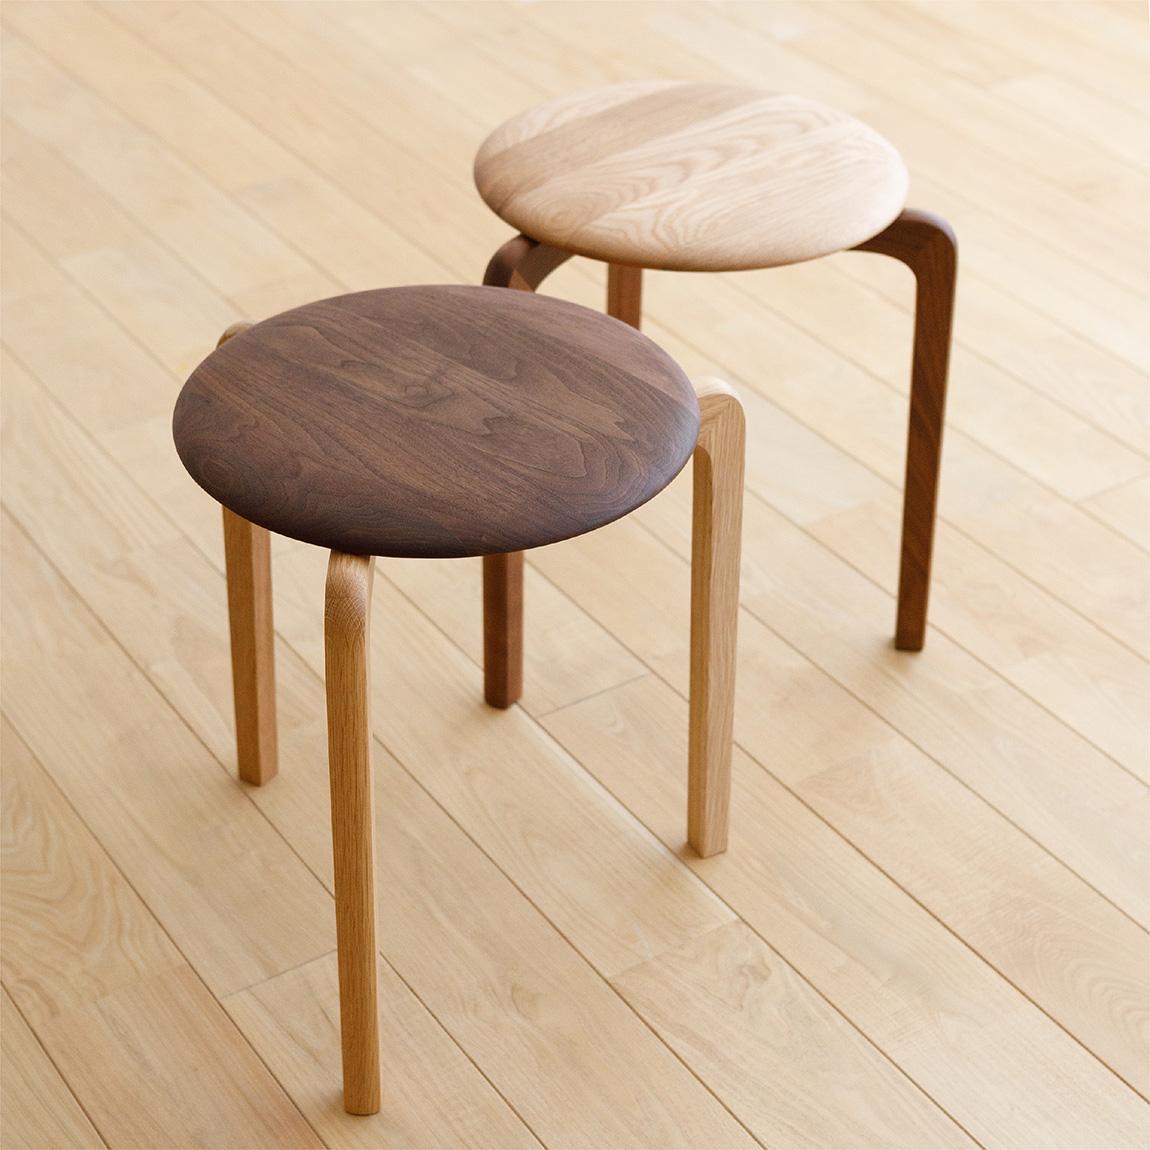 LISCIO Stool (seat:walnut legs:oak), LISCIO Stool (seat:oak legs:walnut)